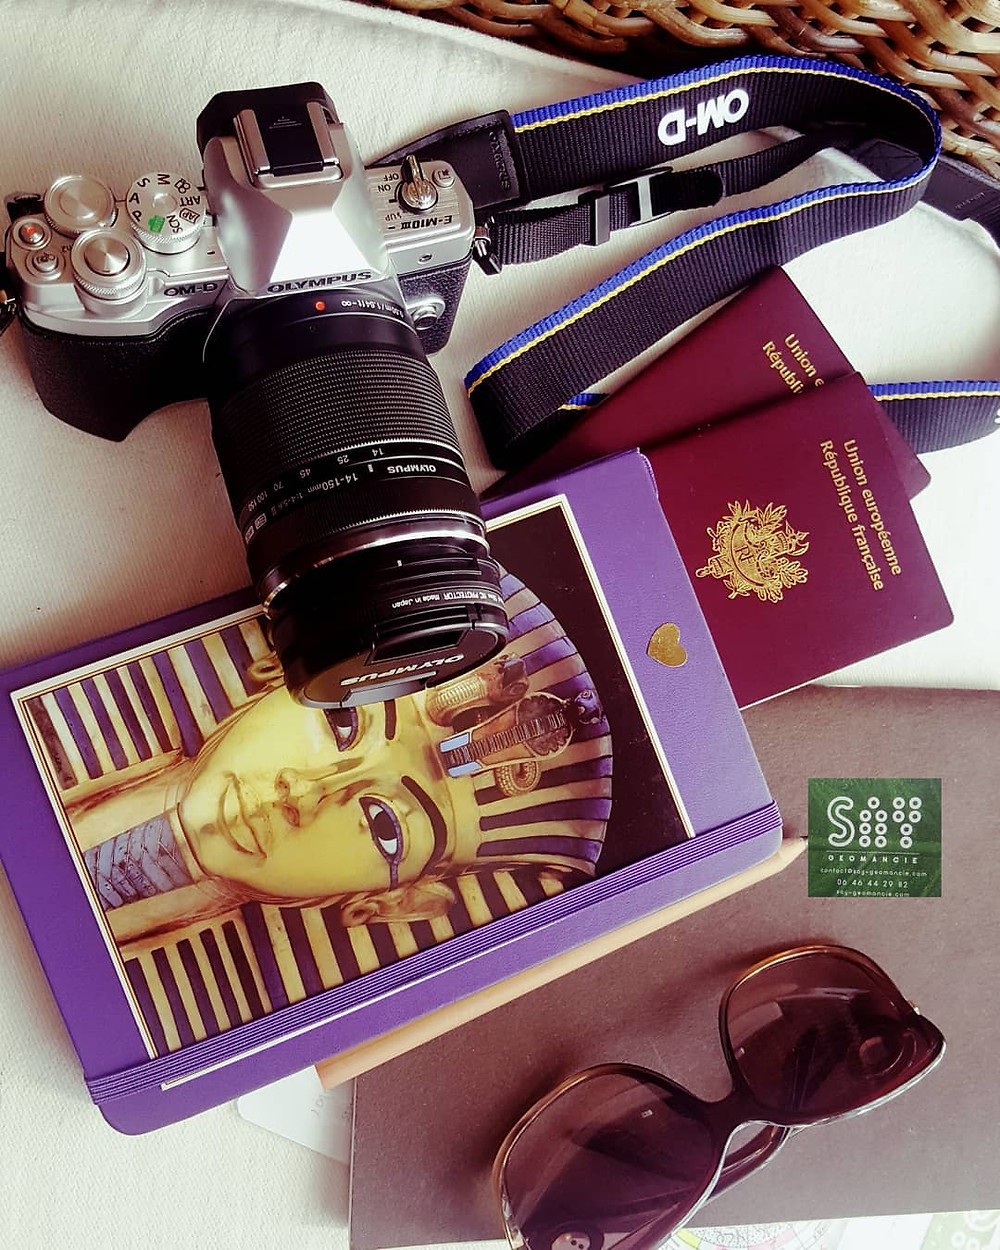 #voyage #voyage traveller passion